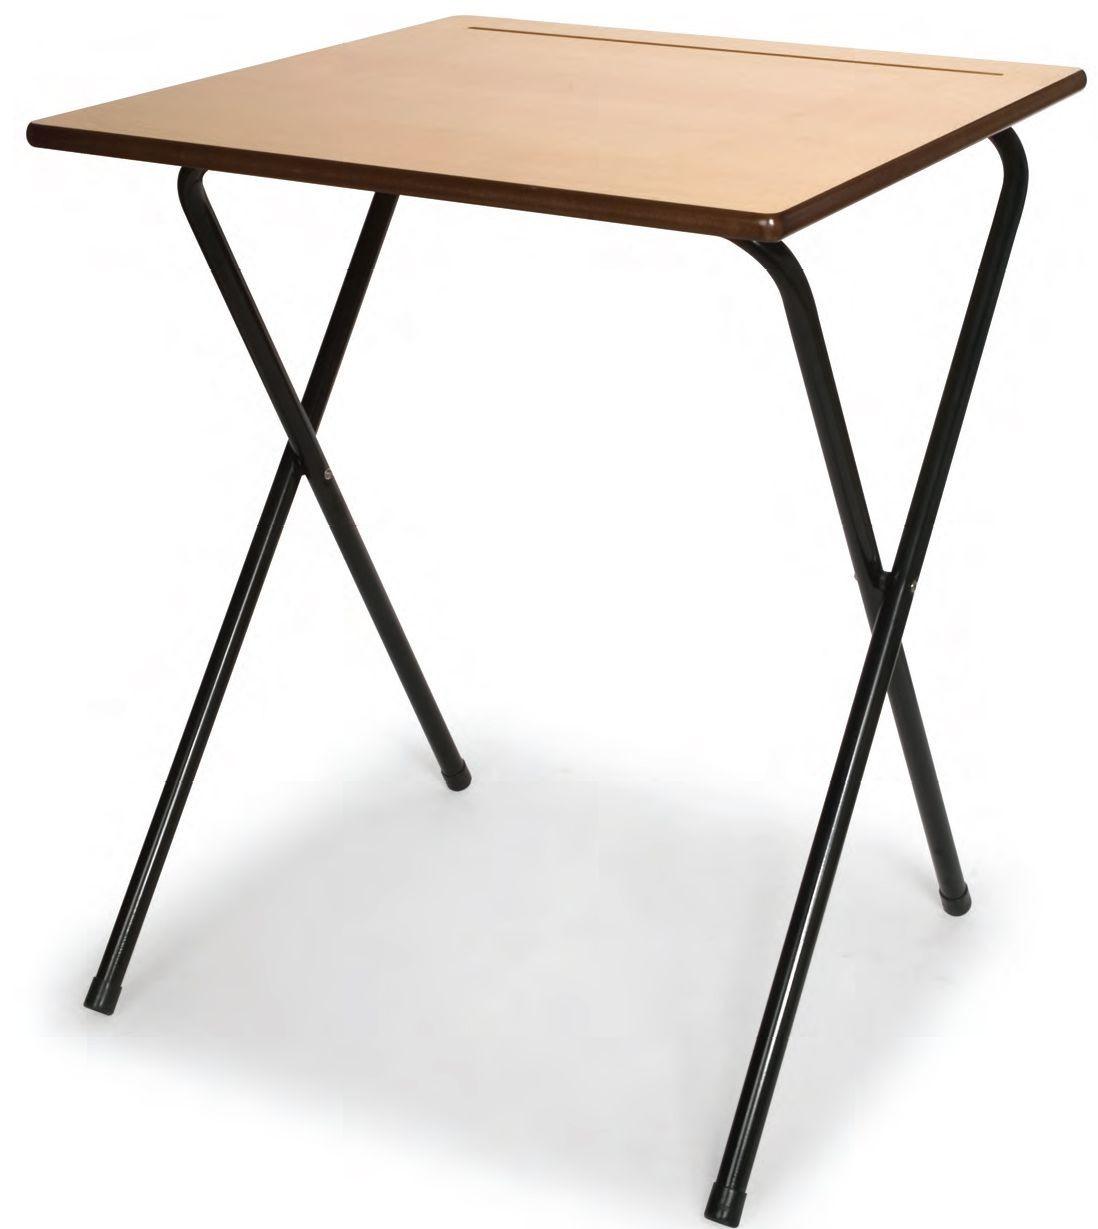 An image of 20 MDF Exam Desks & Trolley Bundle Set - Exam Desks for all Ed...